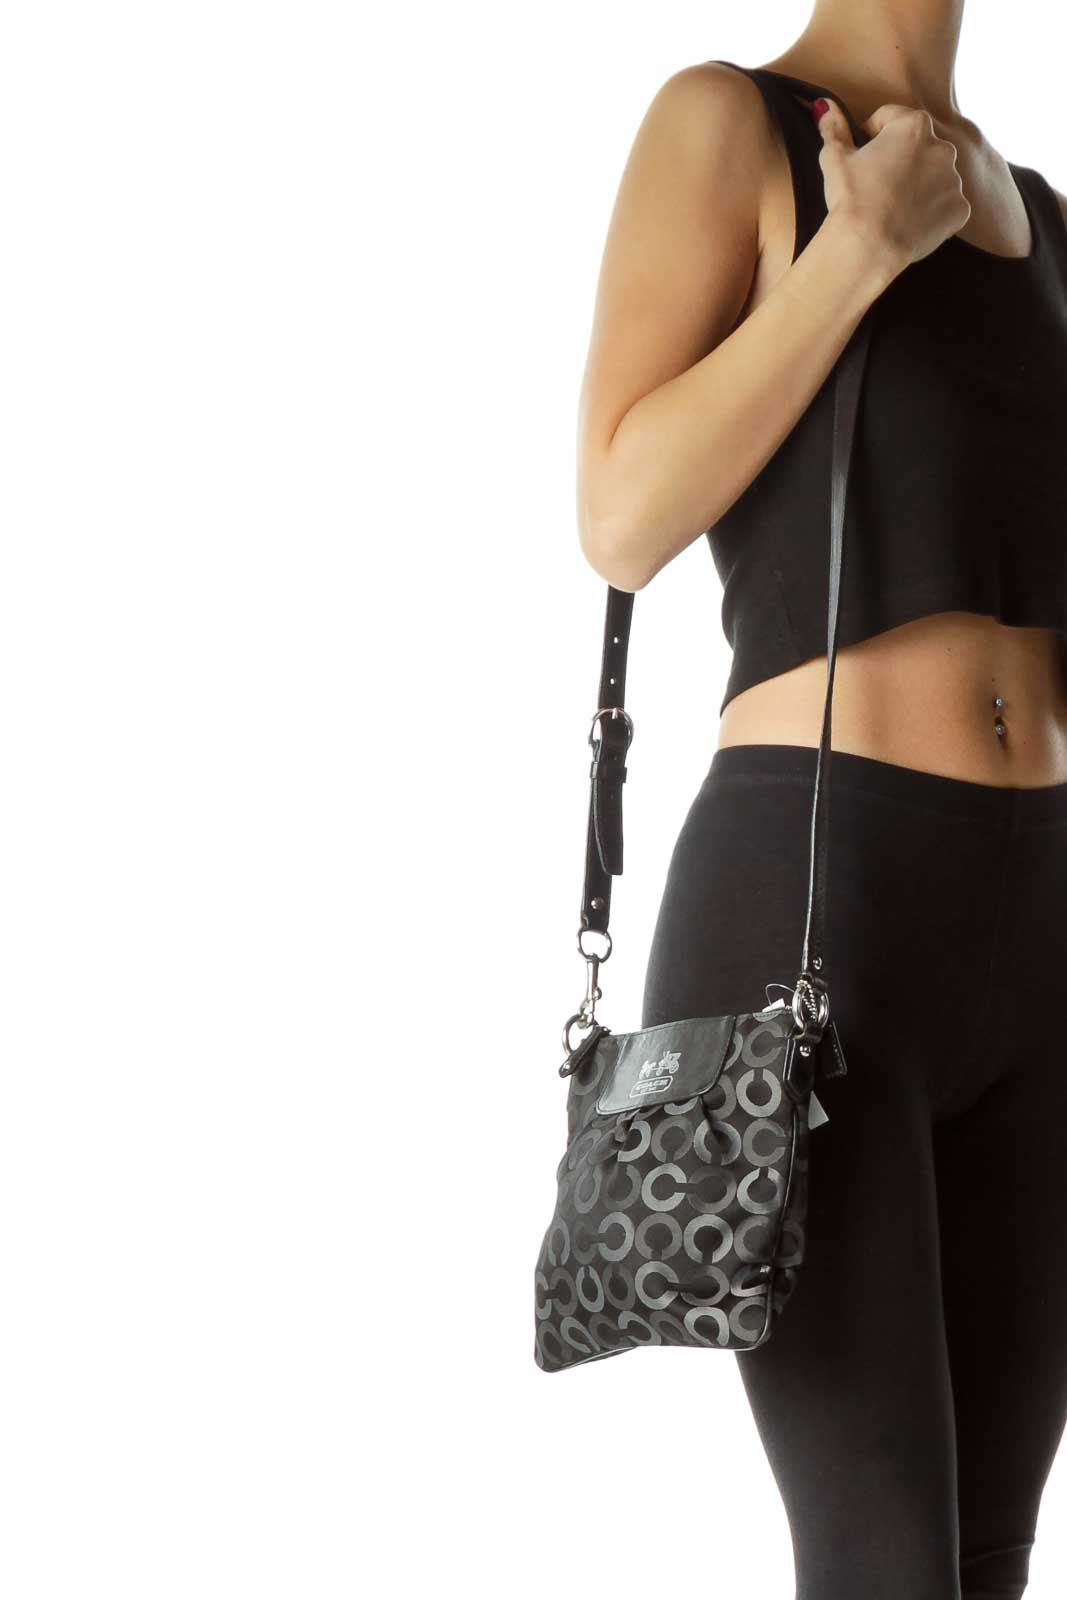 cc5e6d5f Shop Black Circle Print Crossbody Bag clothing and handbags at ...